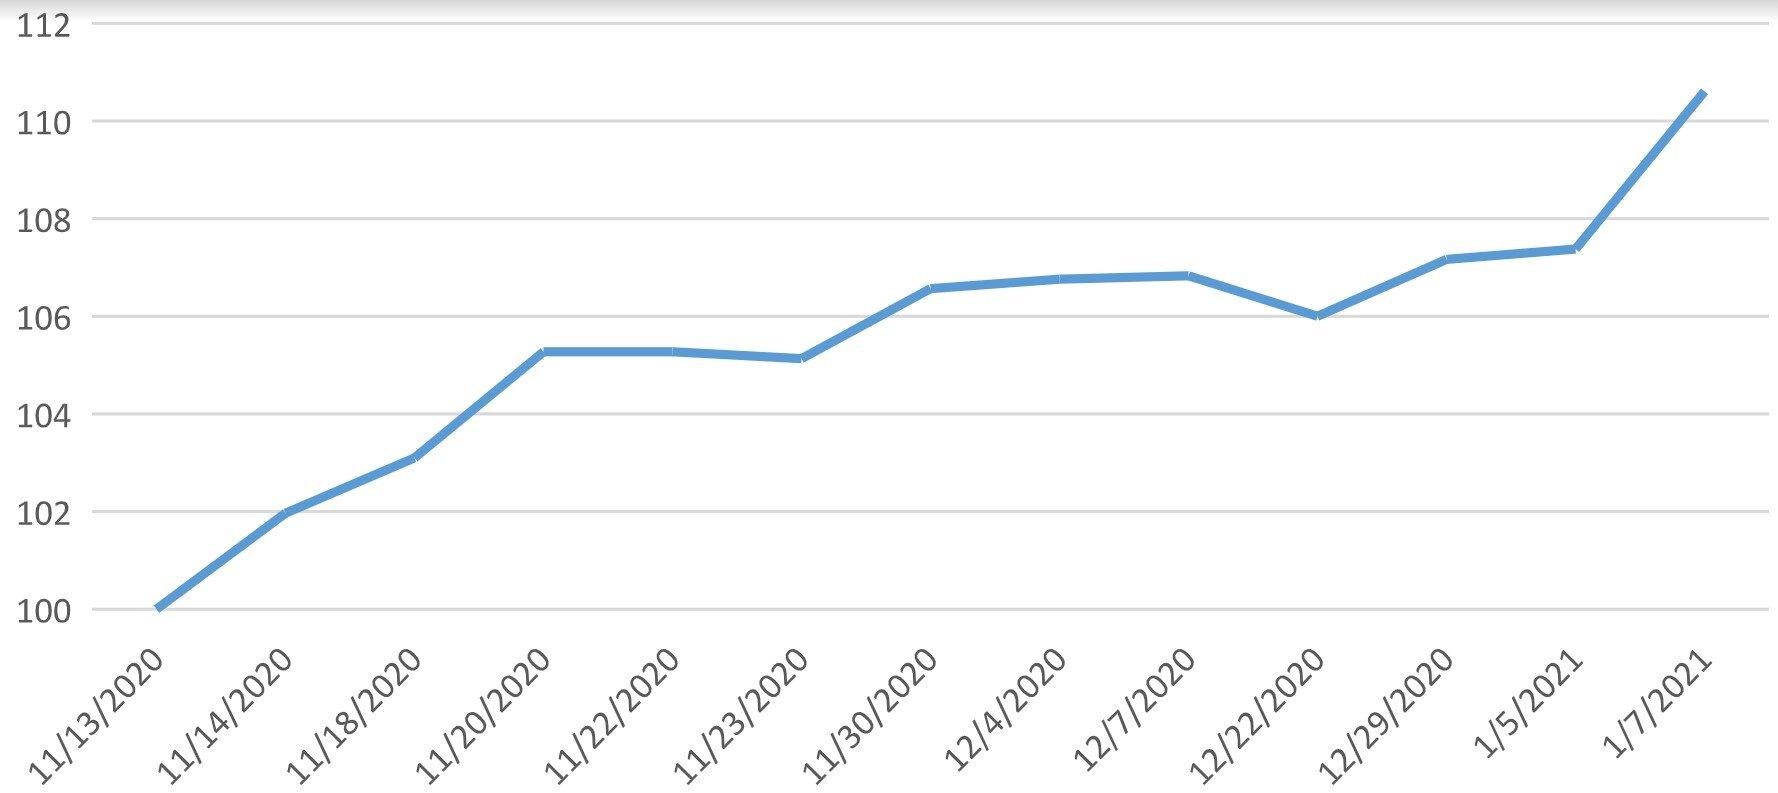 alti wine internal index january 2021.jpg